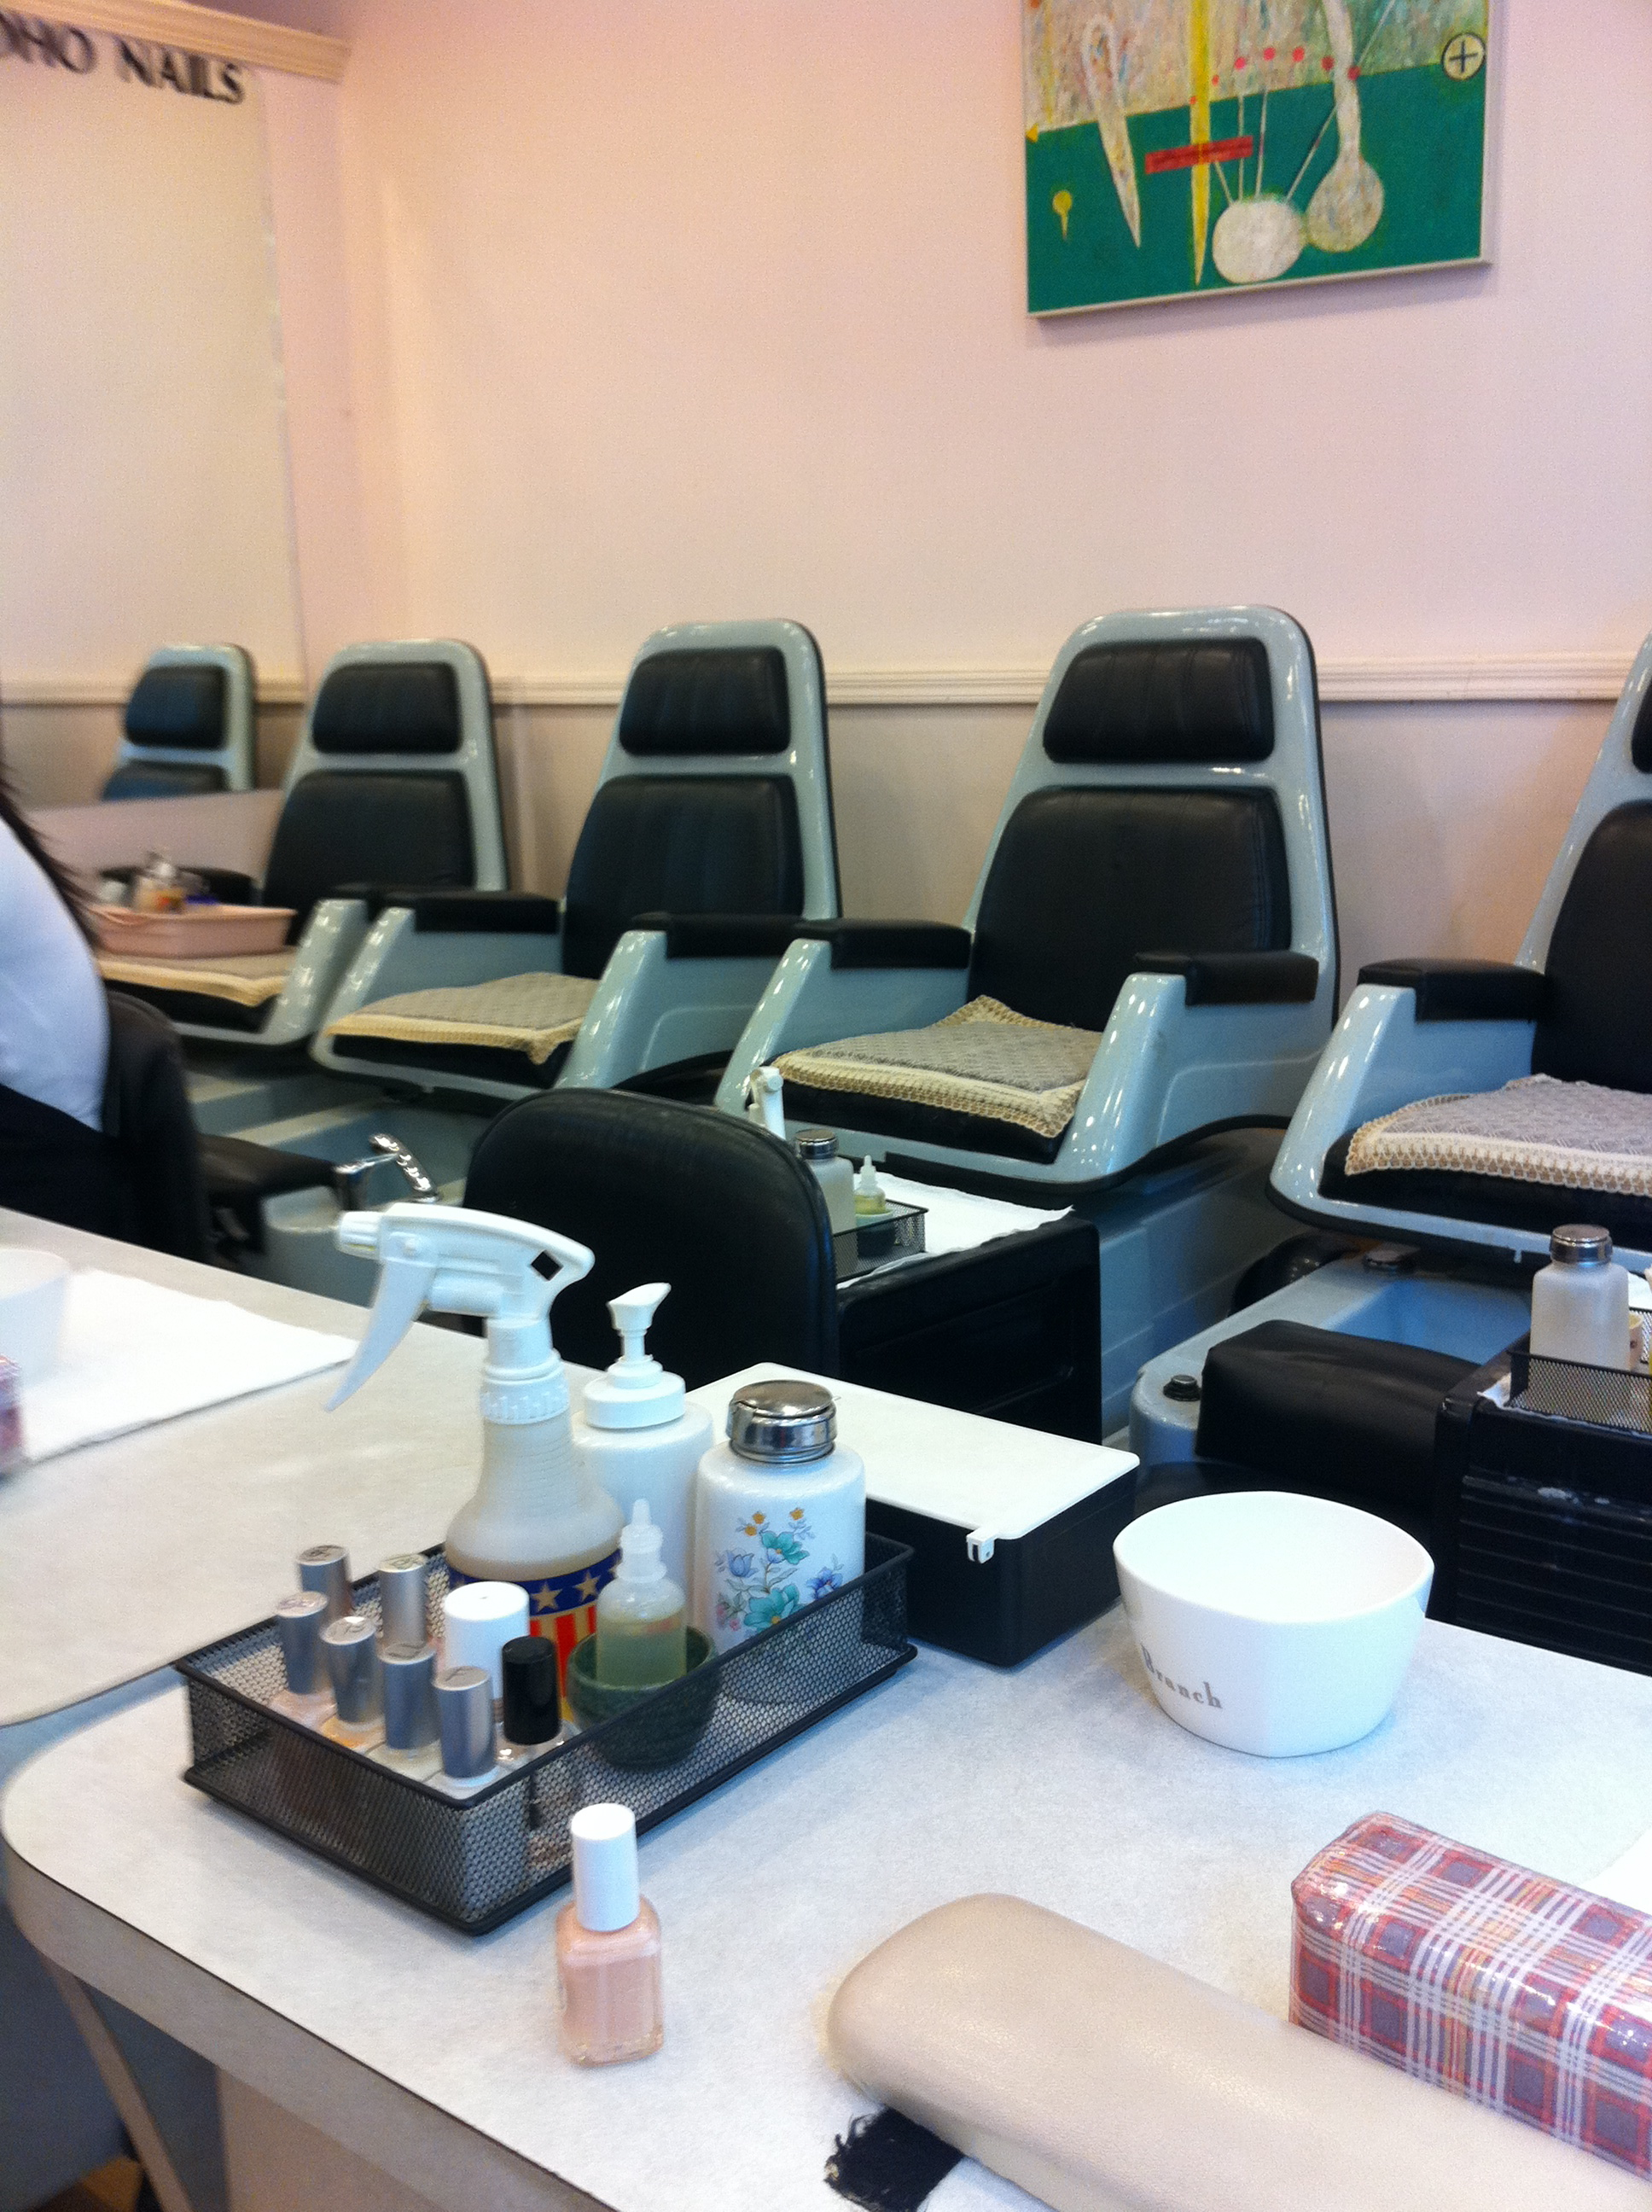 nail market world desks decor clara pinterest home pin desk room